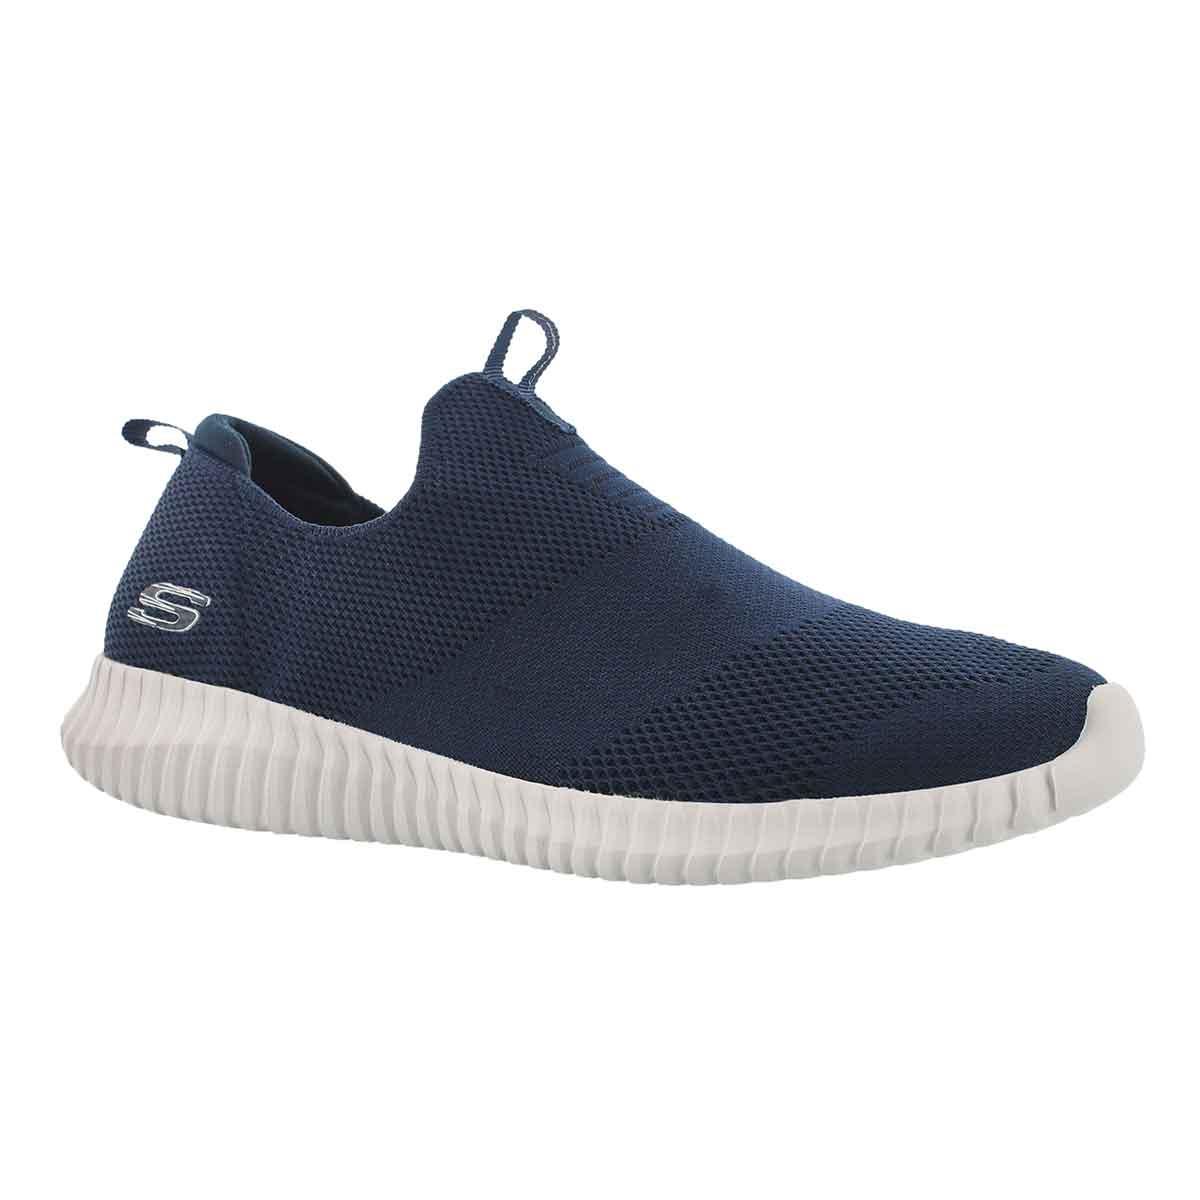 Men's ELITE FLEX WASIK navy slip on shoes